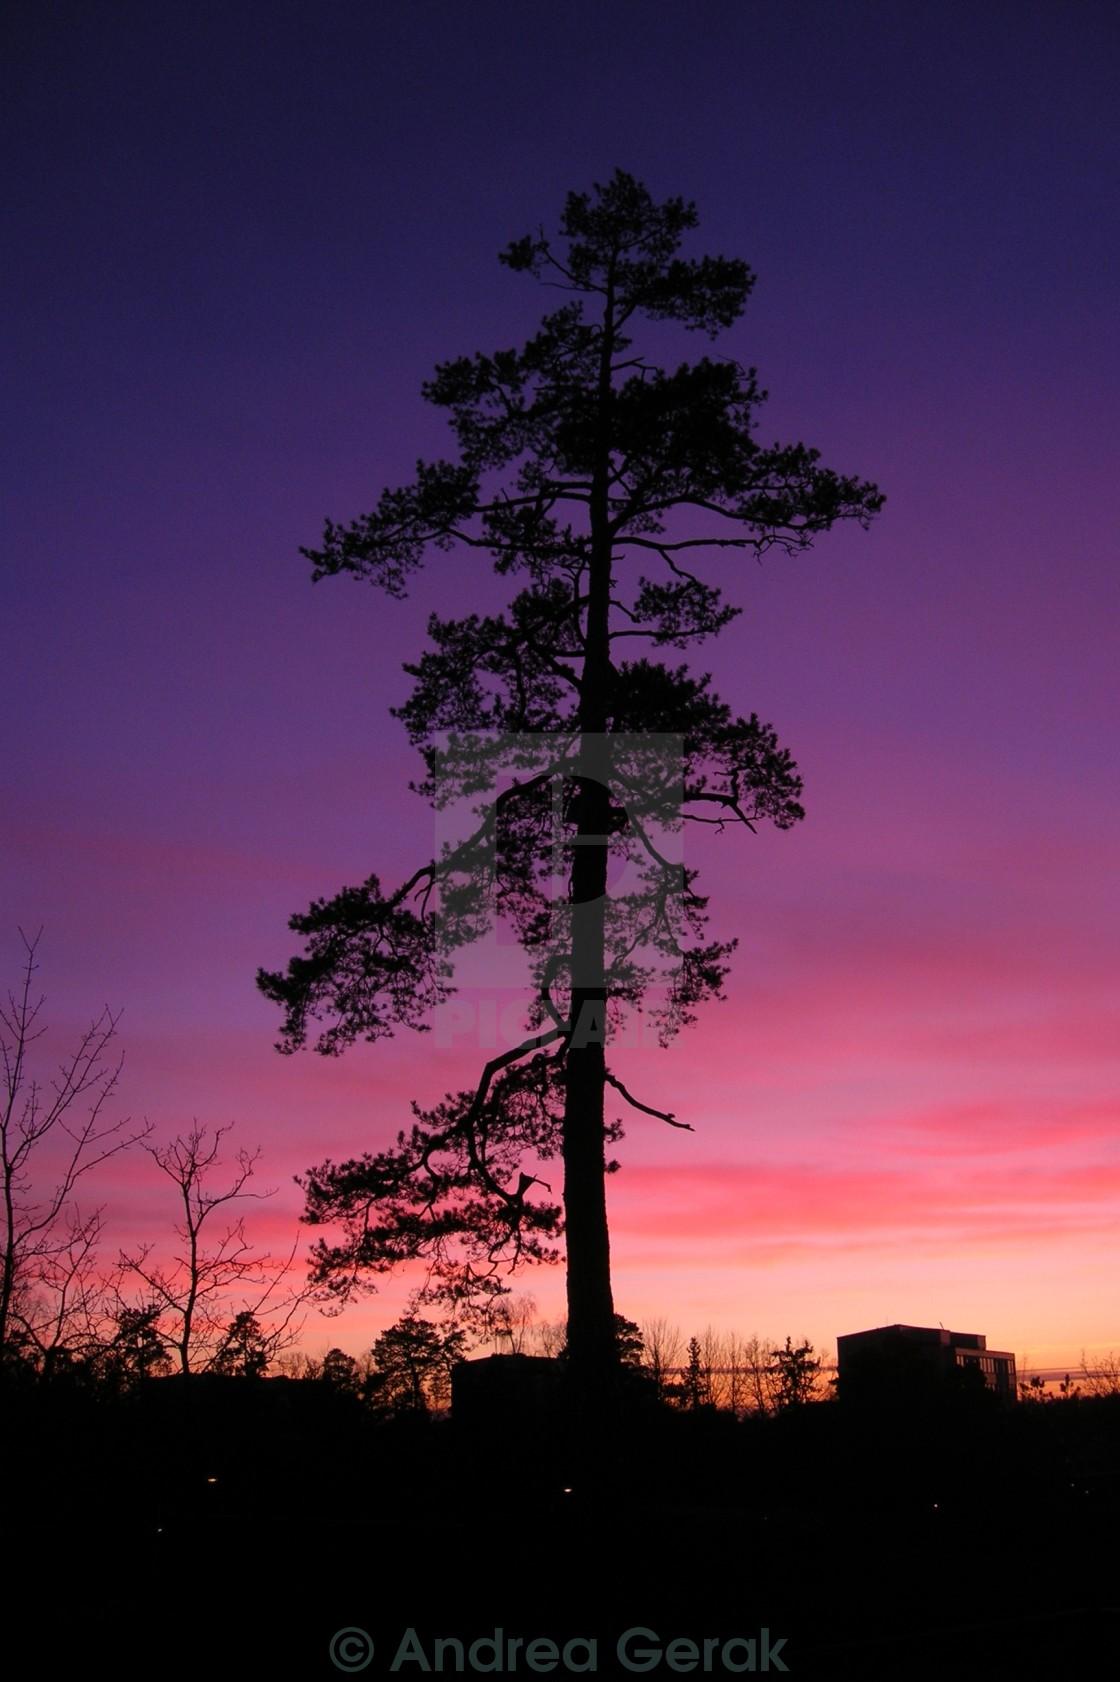 Purple sky, pine tree